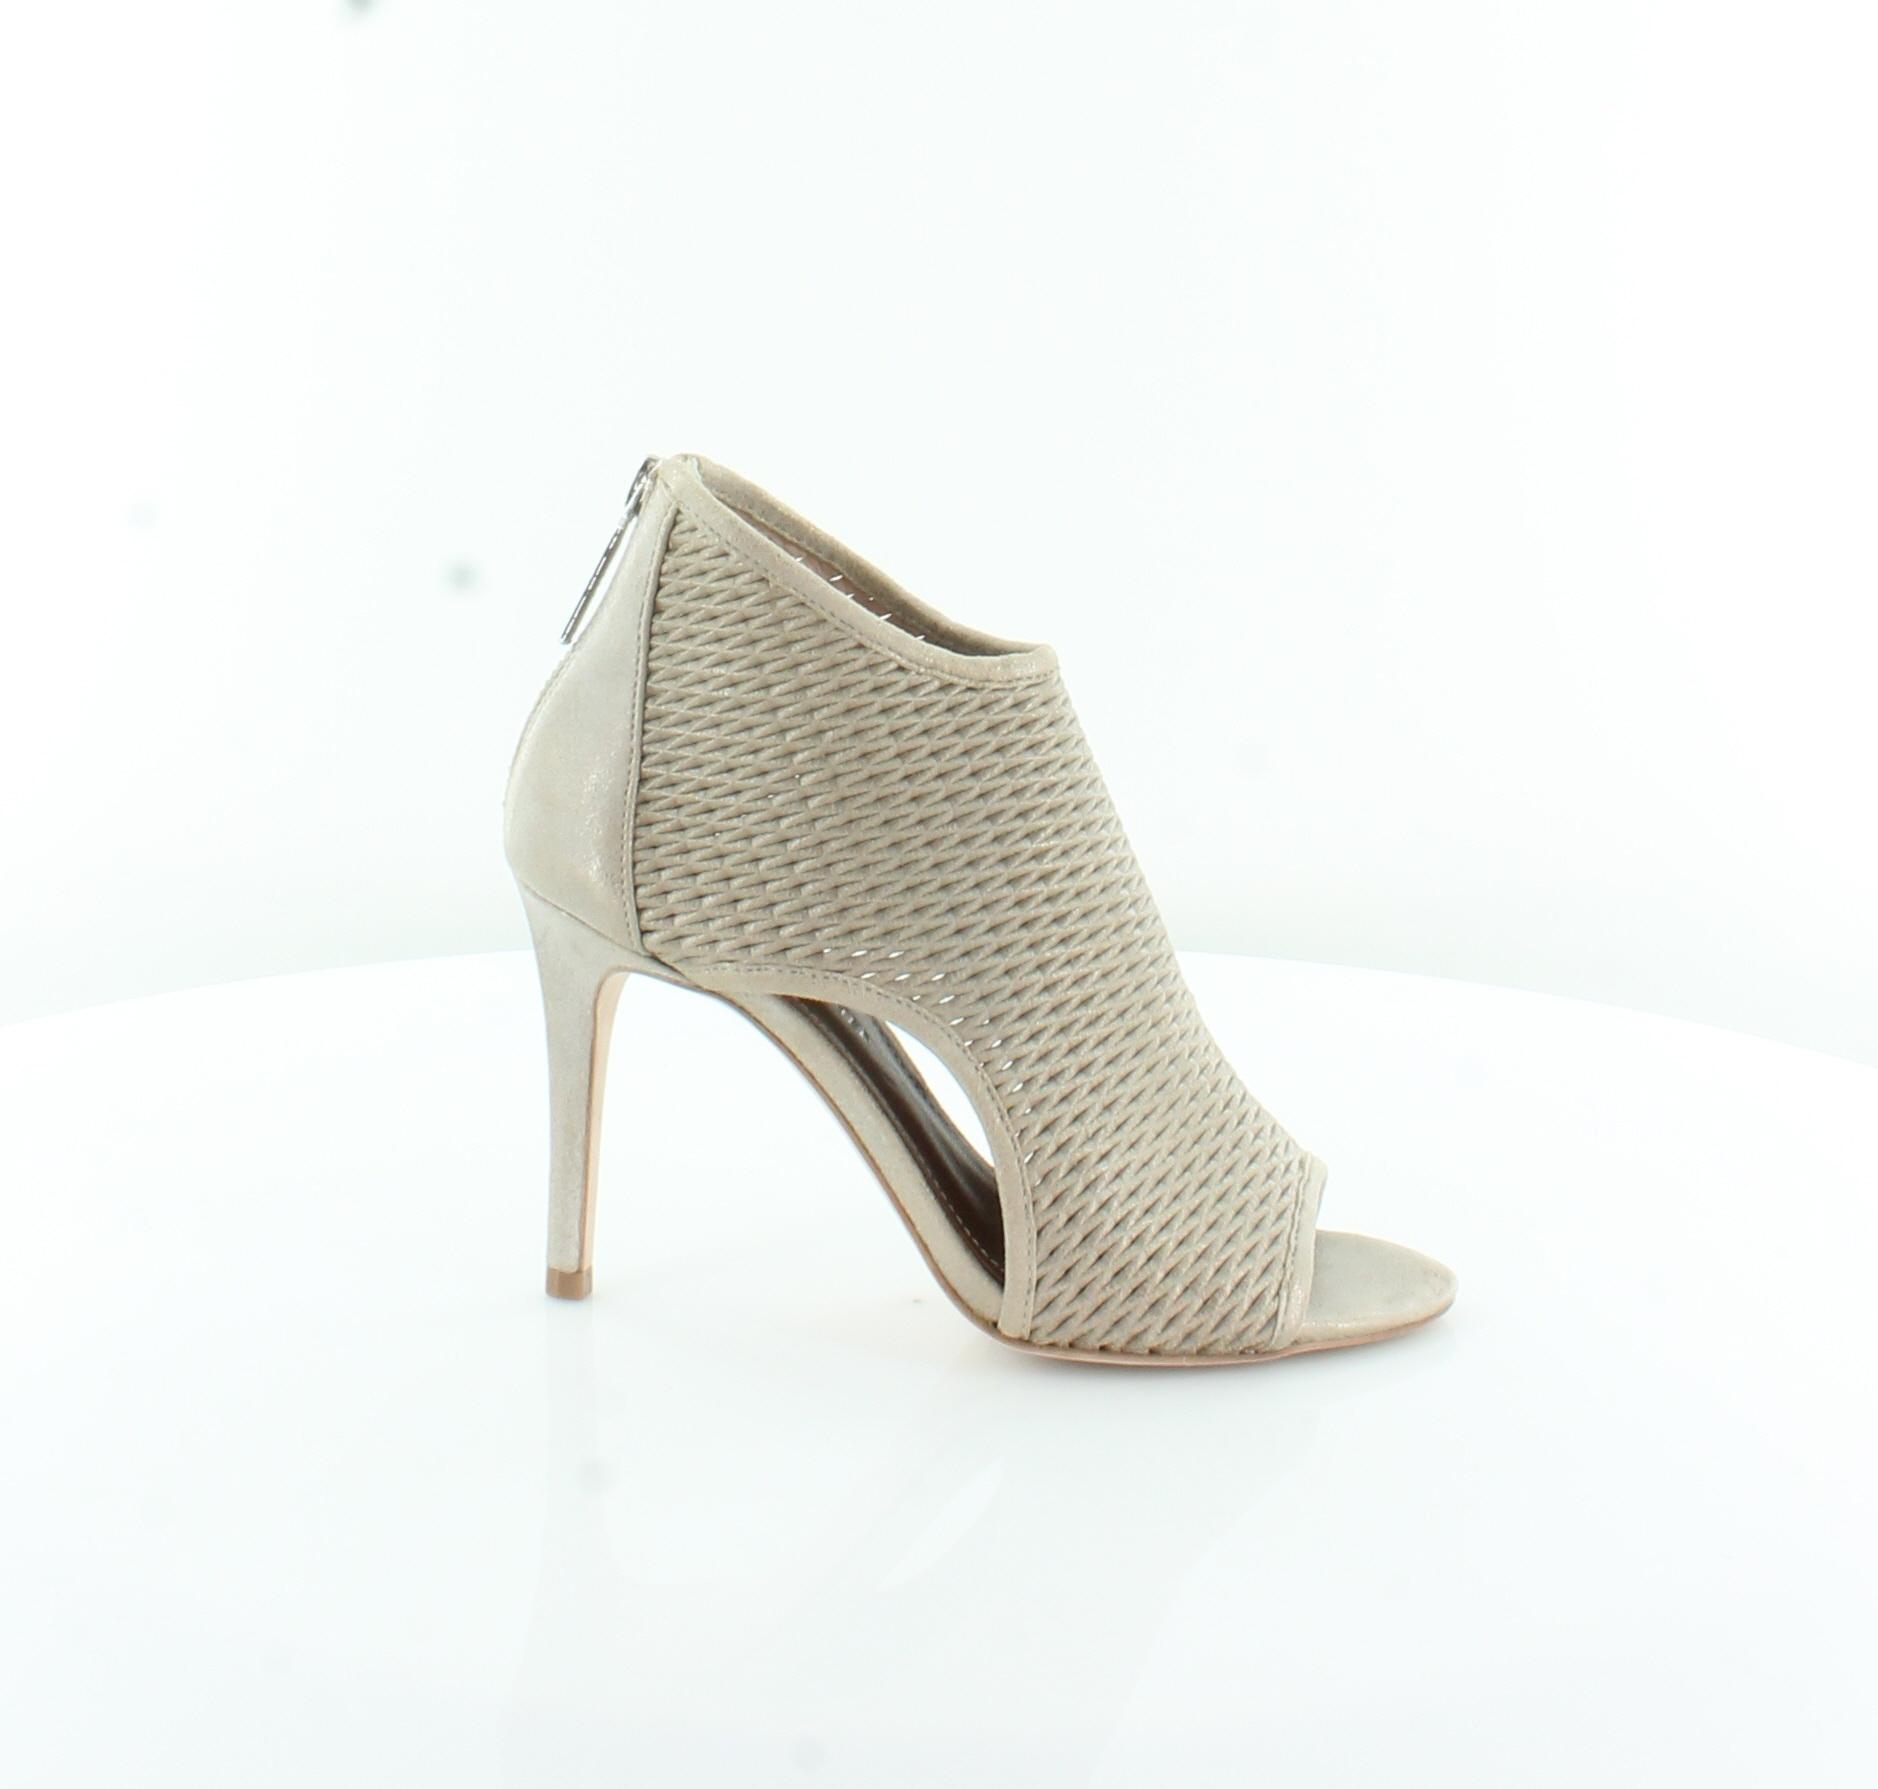 9717c5f33ba Details about Donald J Pliner Ashlyn Beige Womens Shoes Size 5 M Heels MSRP  $248